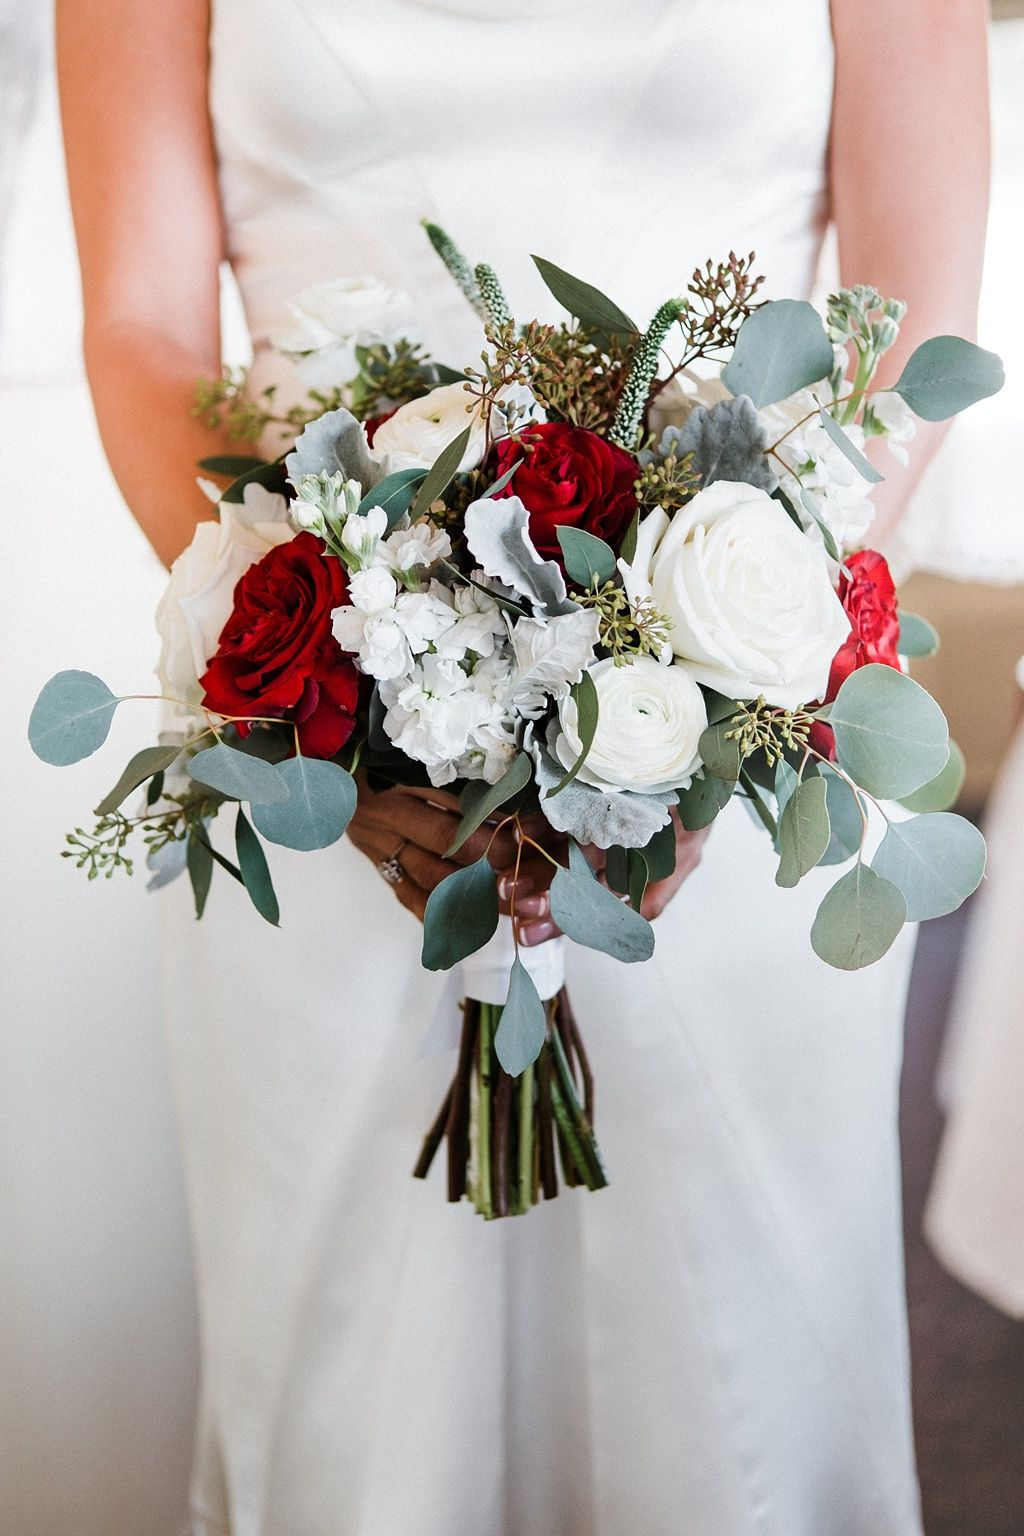 Flagstaff House Wedding In Winter In Boulder Colorado Red Rose Bouquet Wedding Red Rose Wedding Floral Wedding